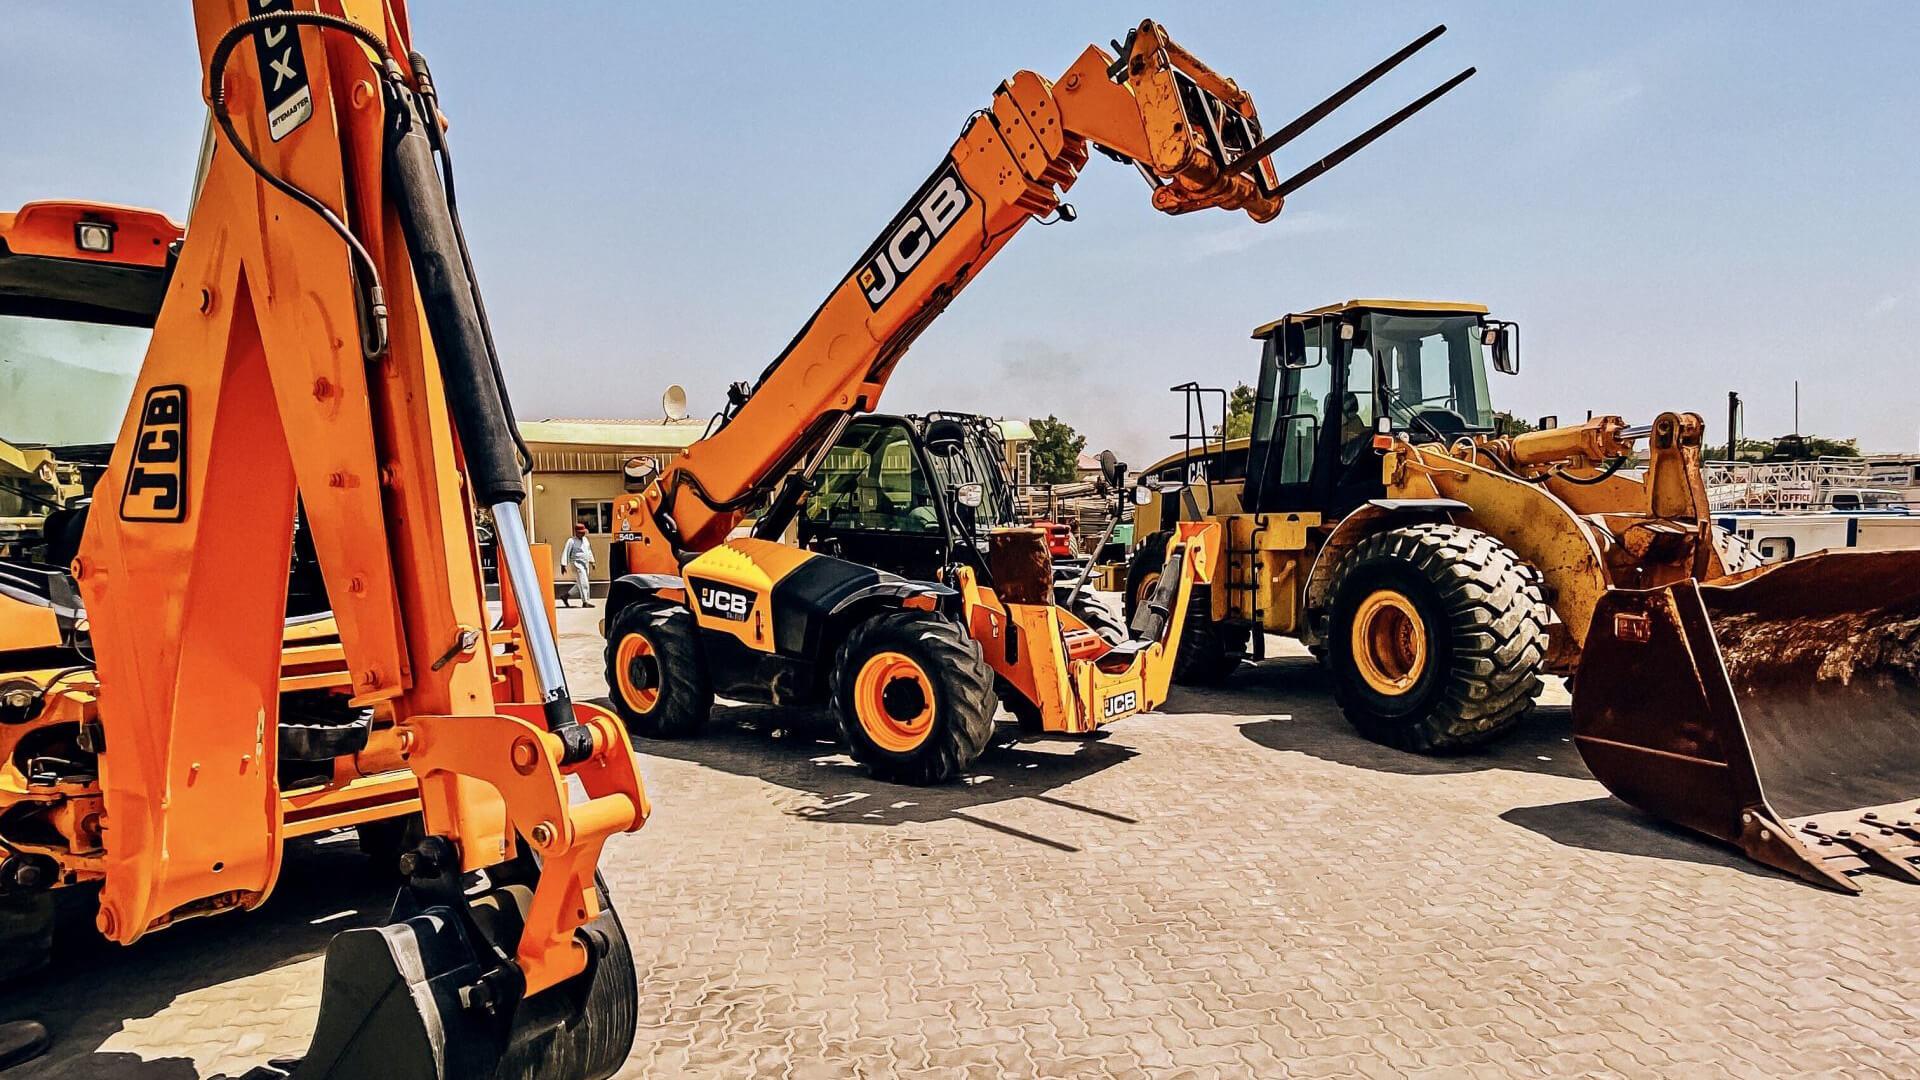 jcb machinery